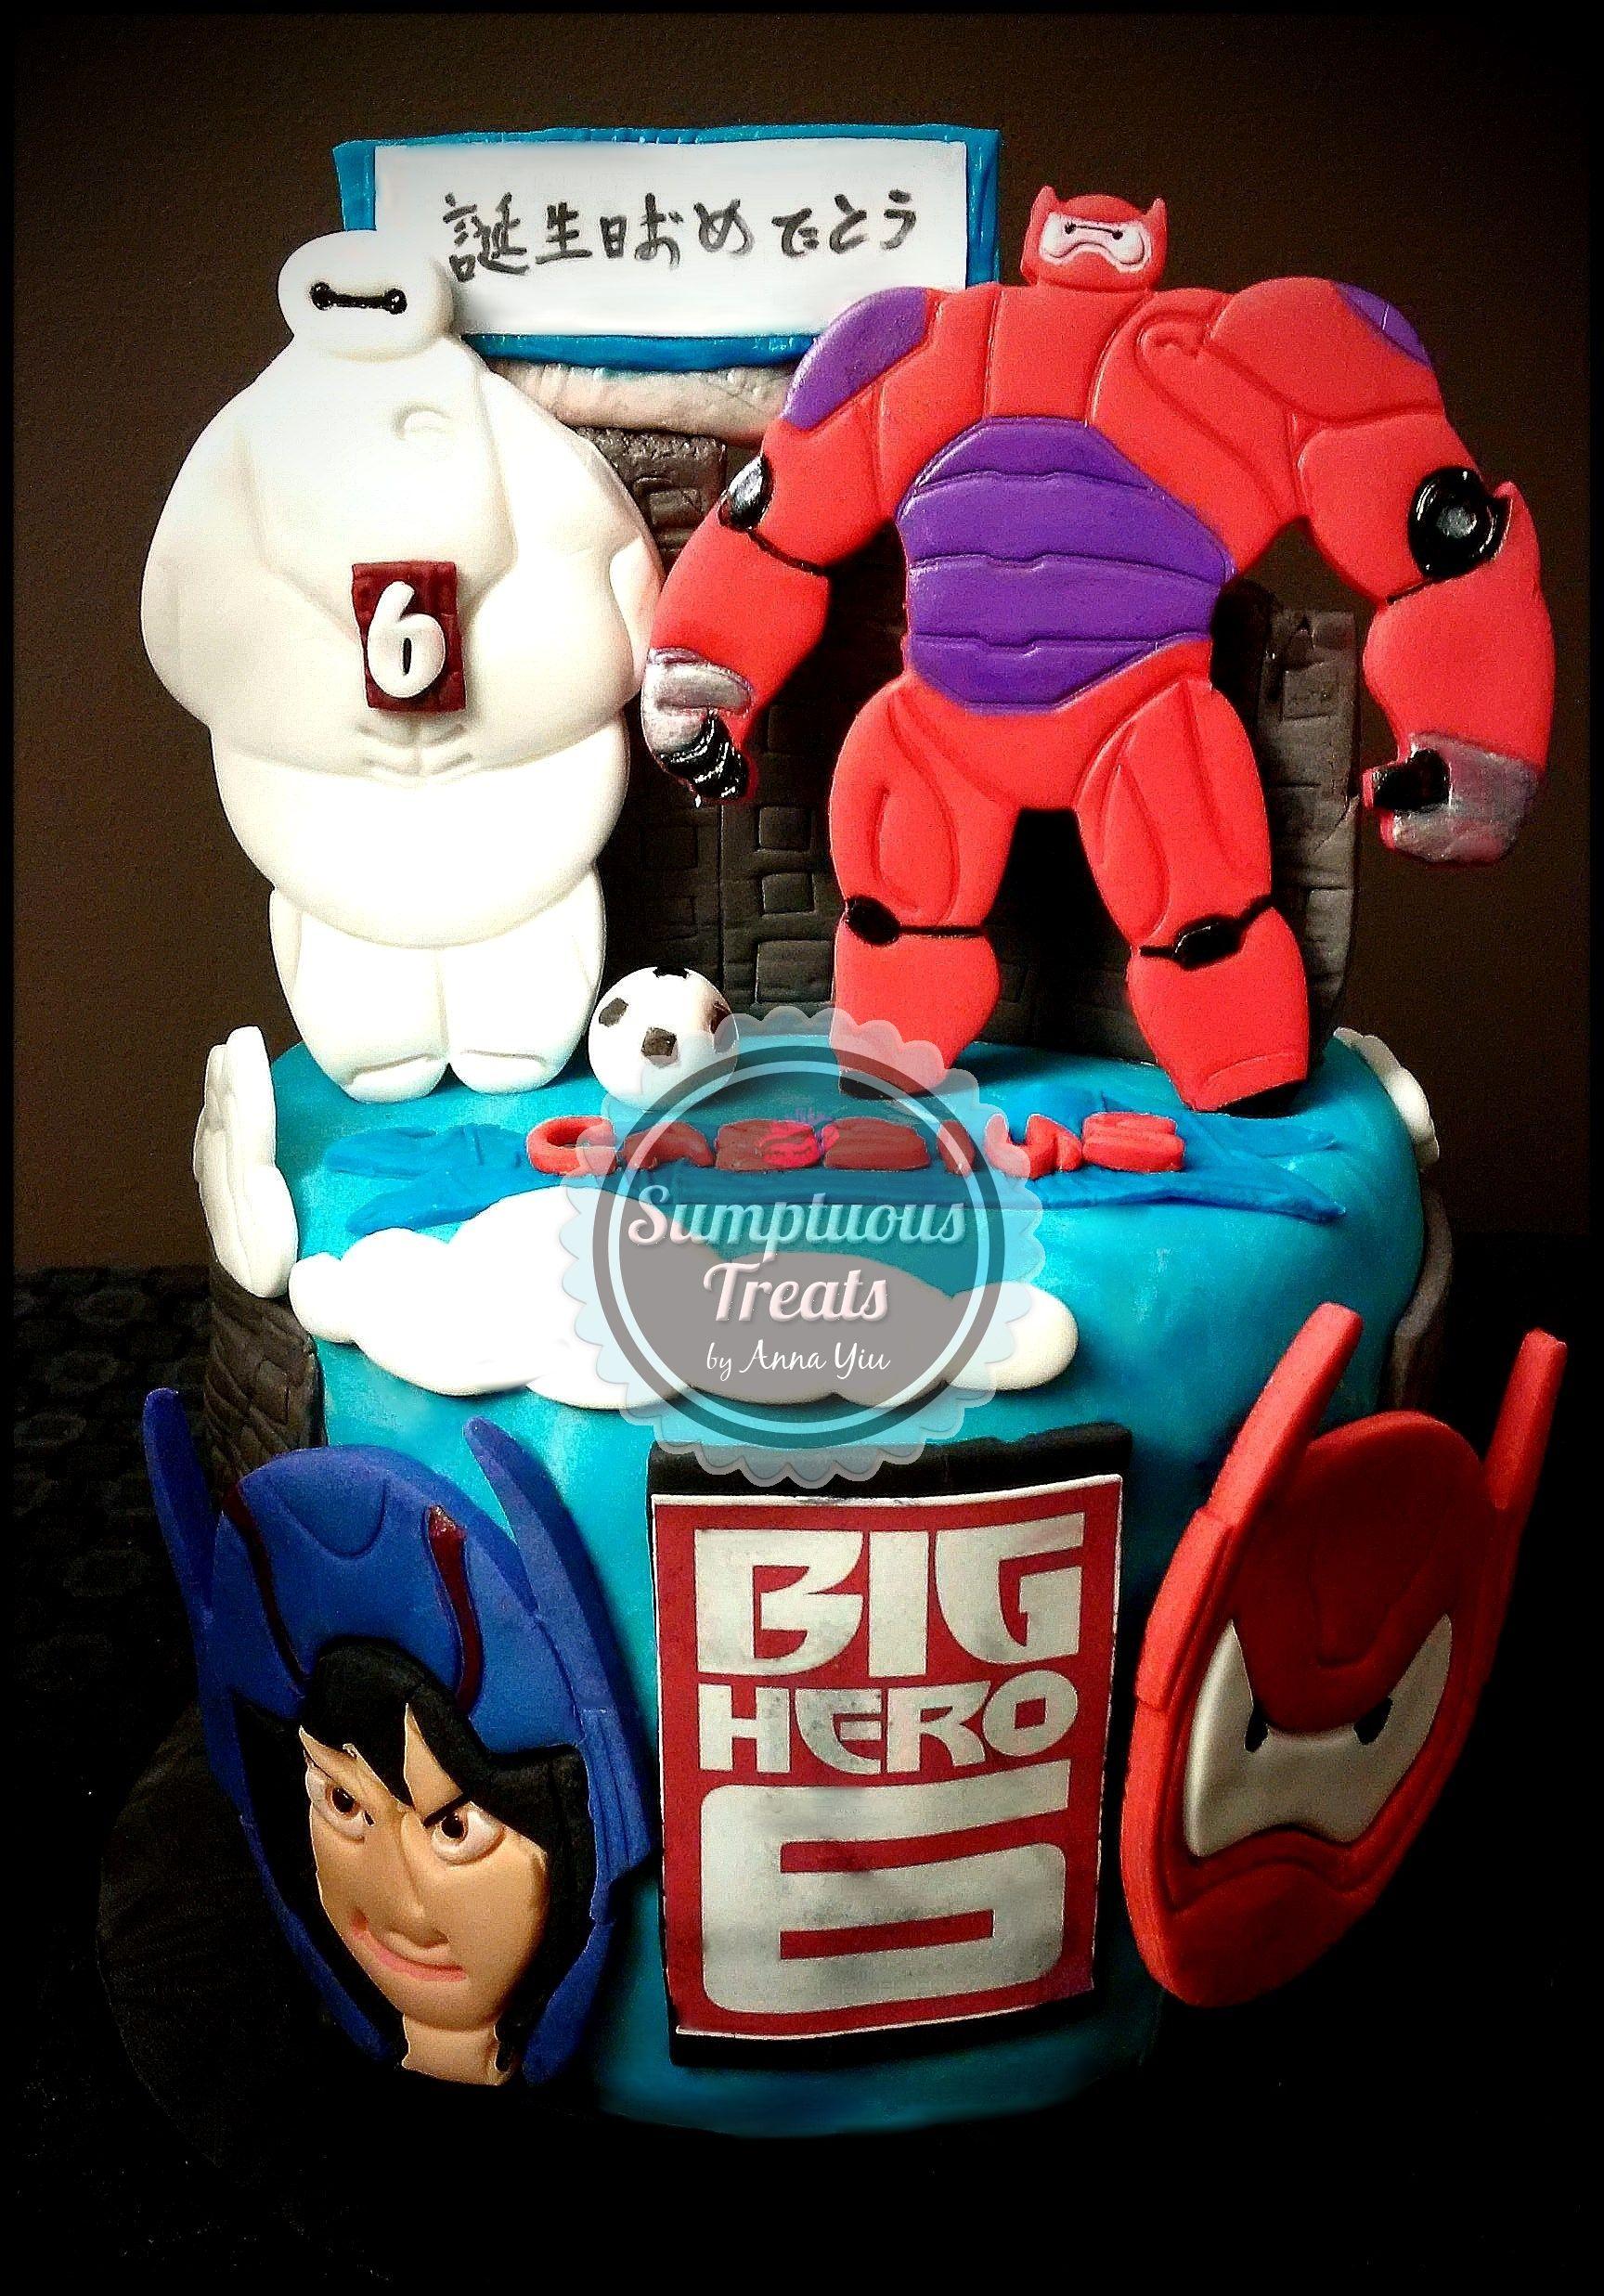 Big Hero 6 Cake CustomMadeToOrder Cakes Desserts Edible Art